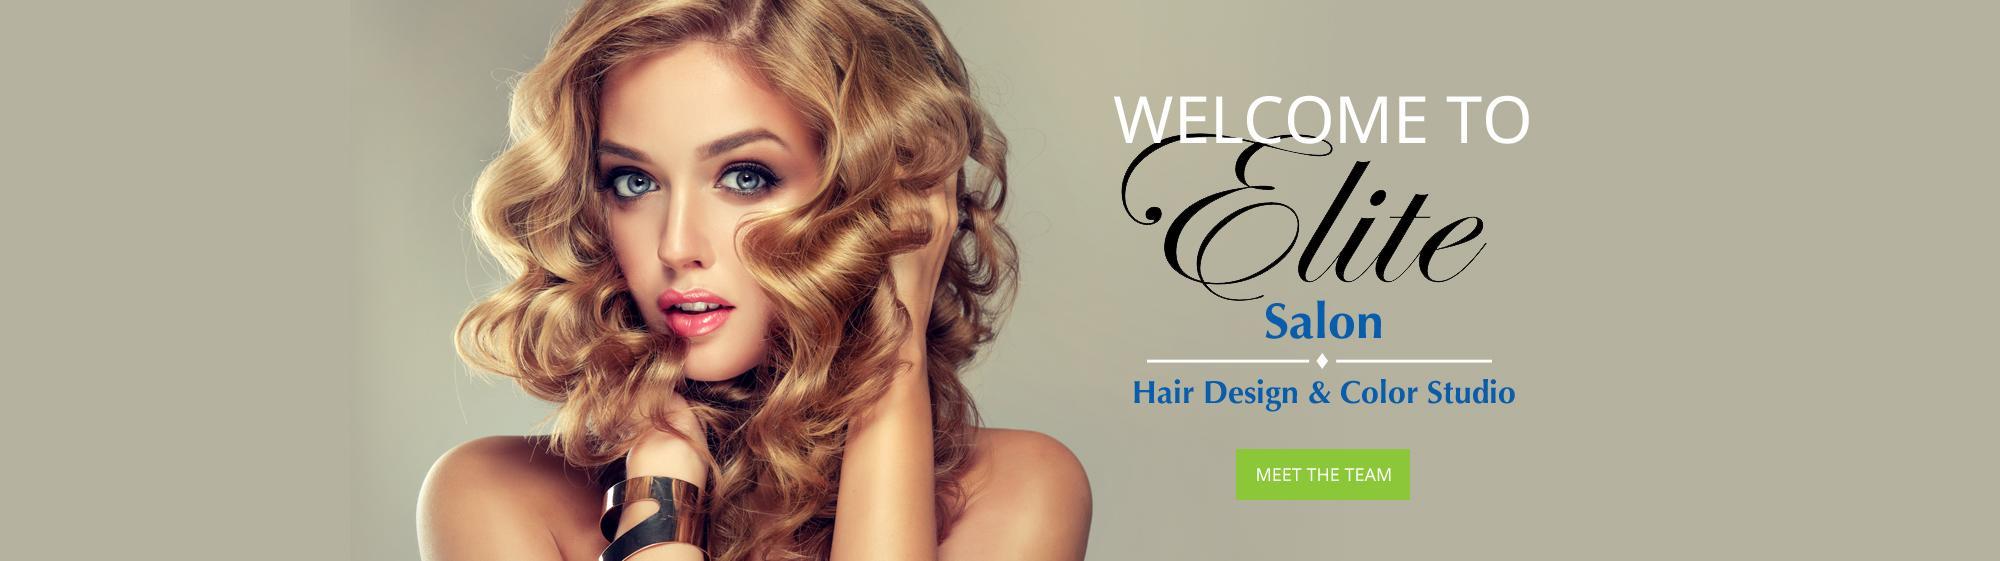 Welcome to Elite Salon Hair Design & Color Studio Meet the Team